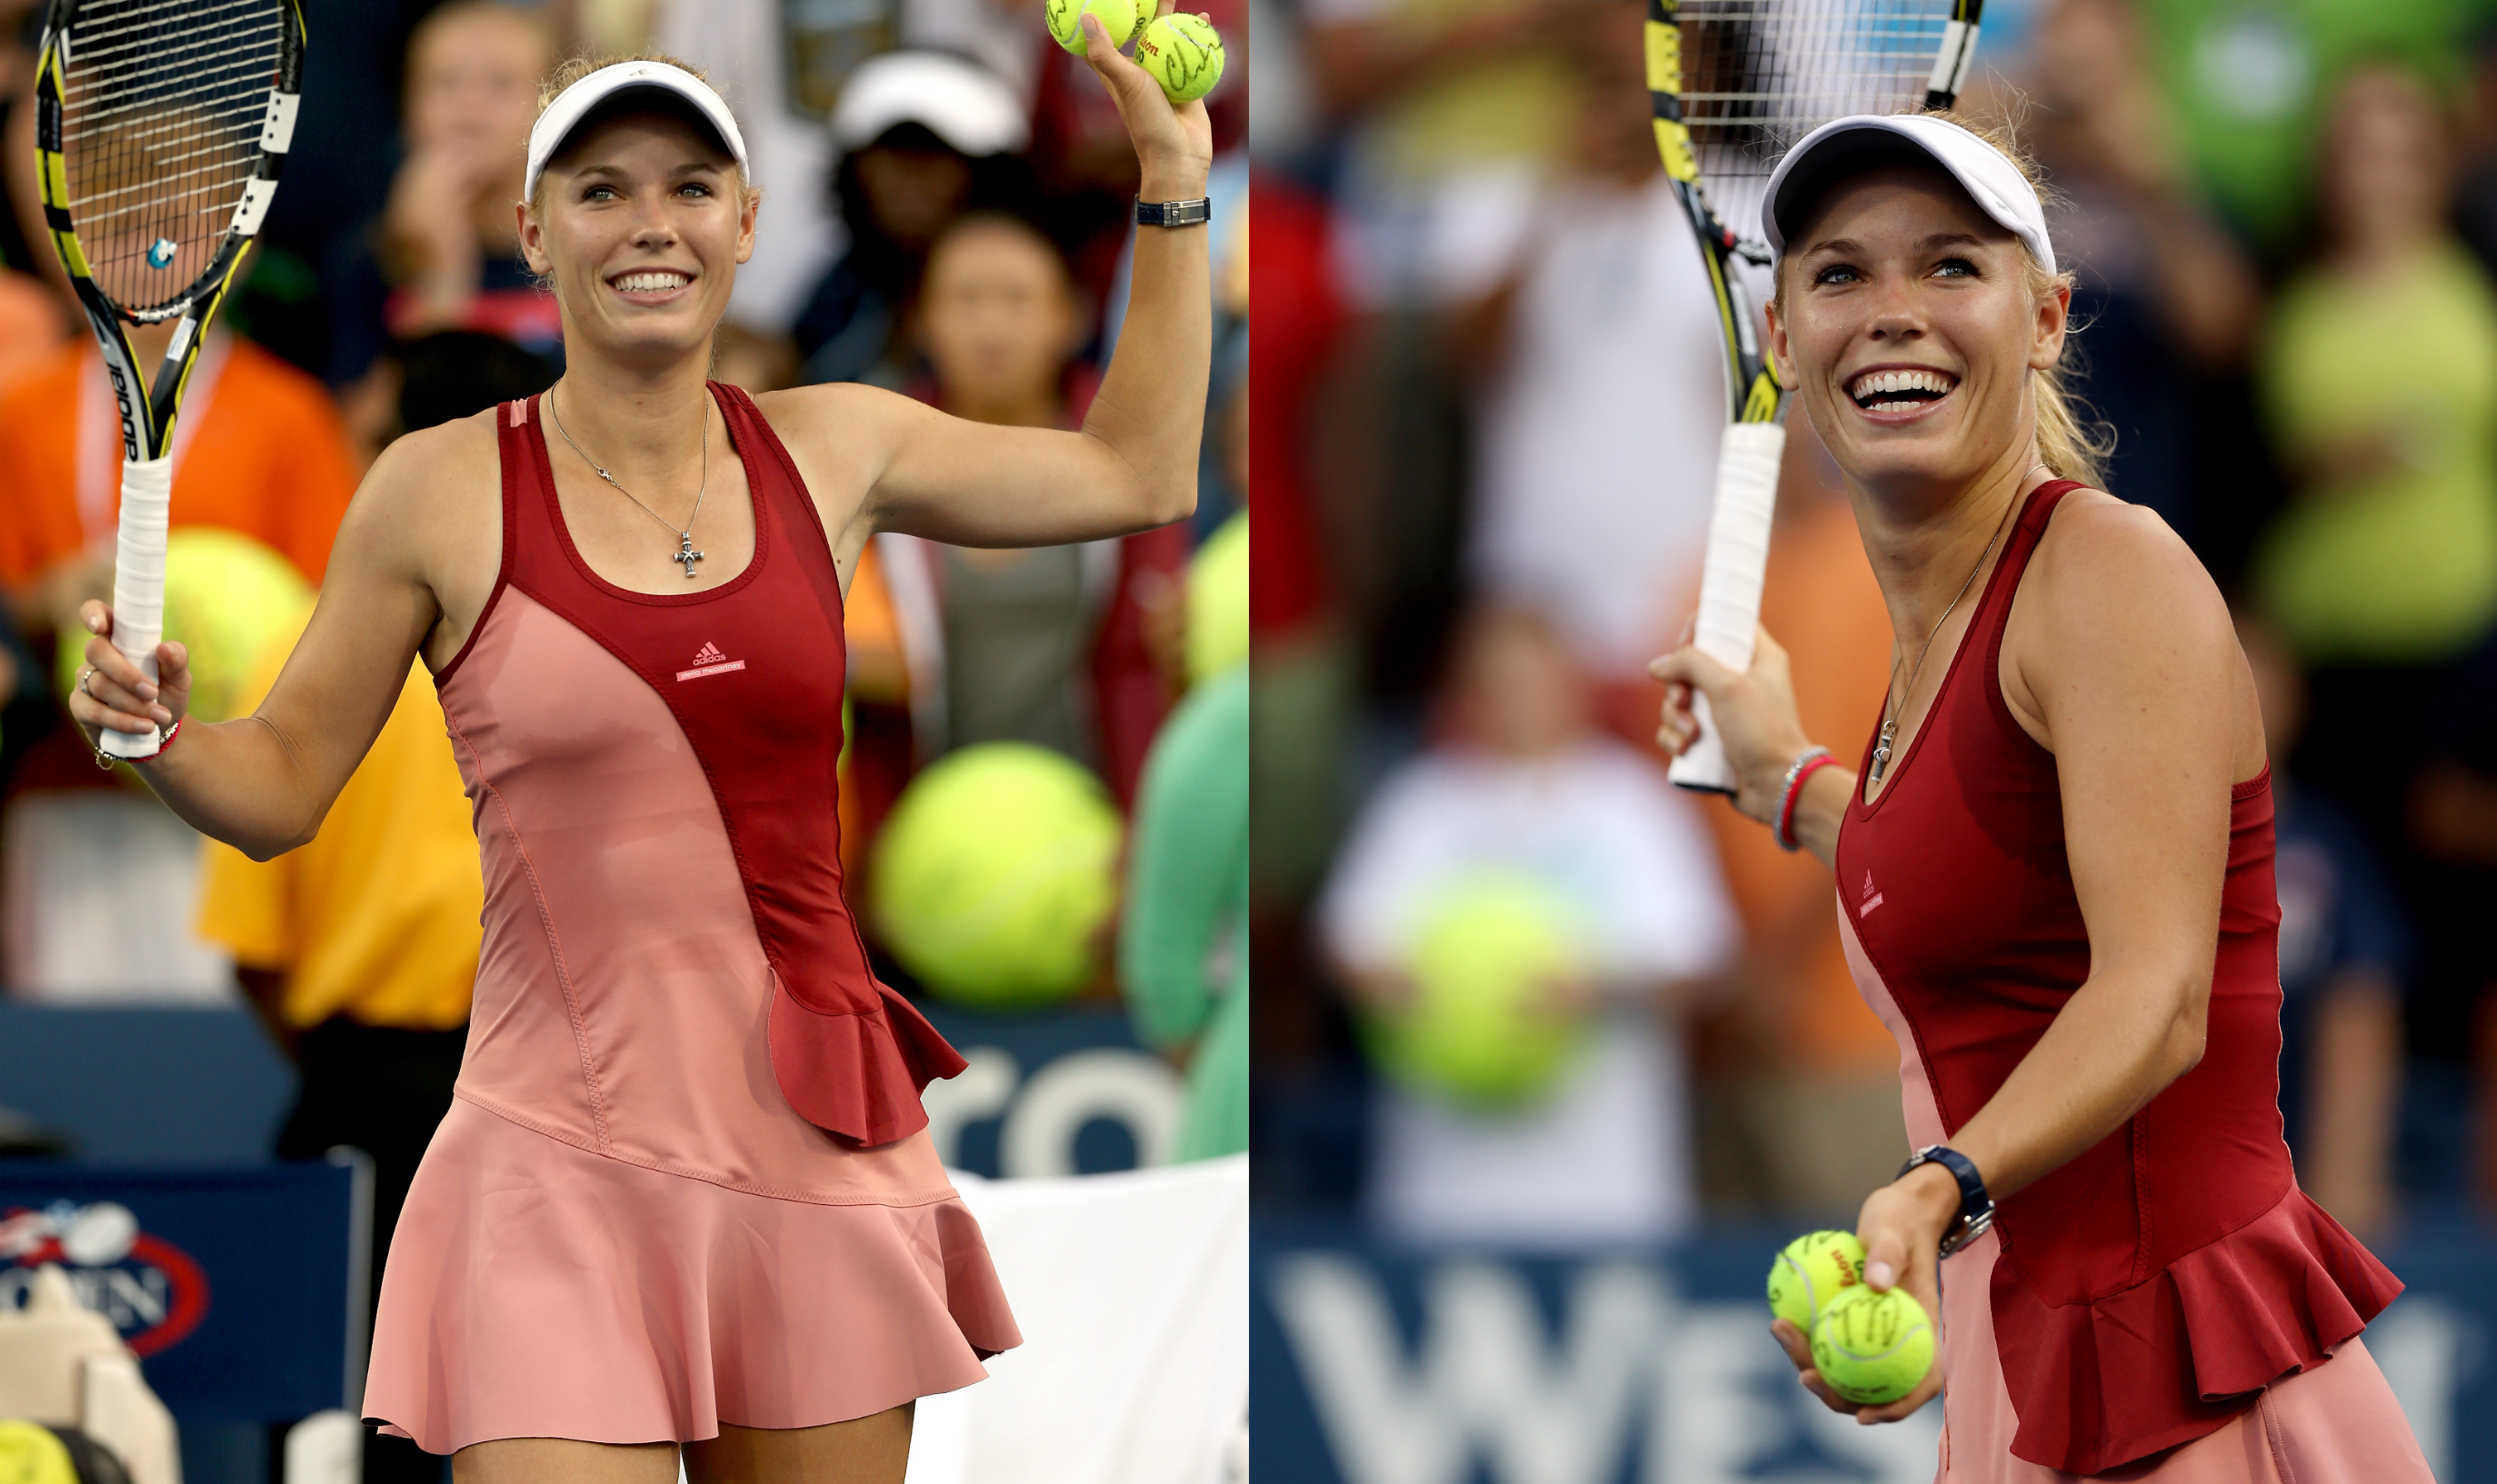 Although she had a good run, Wozniacki wore more unnecessary ruffles.